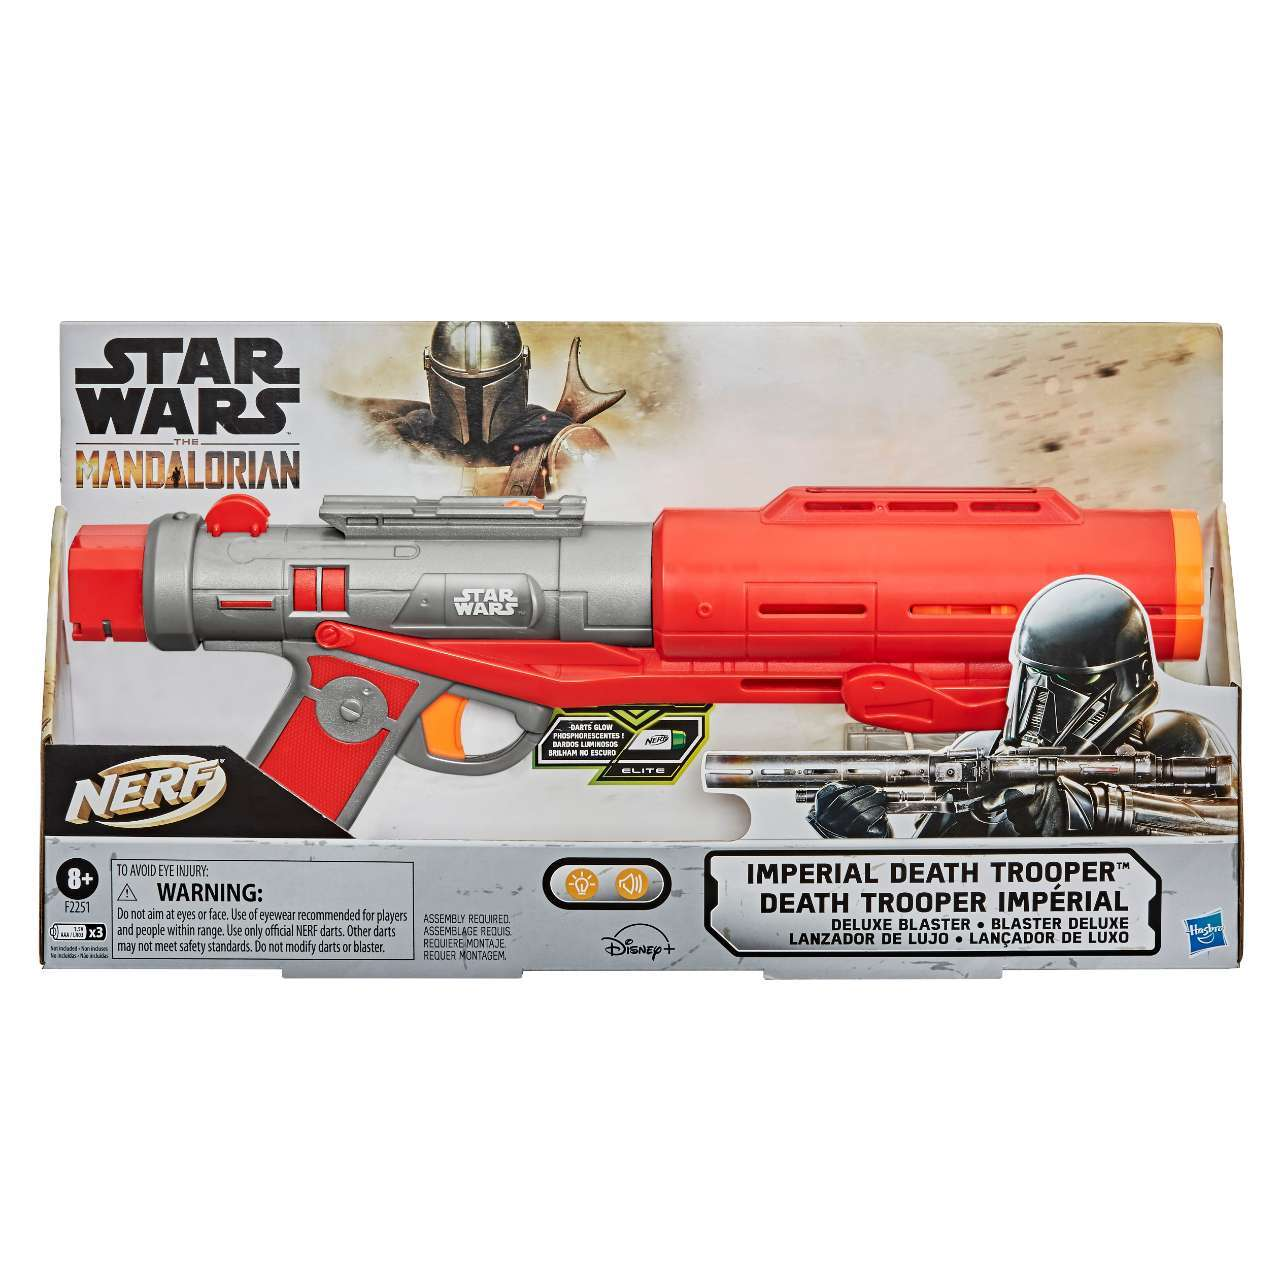 NERF STAR WARS IMPERIAL DEATH TROOPER Blaster - in pck